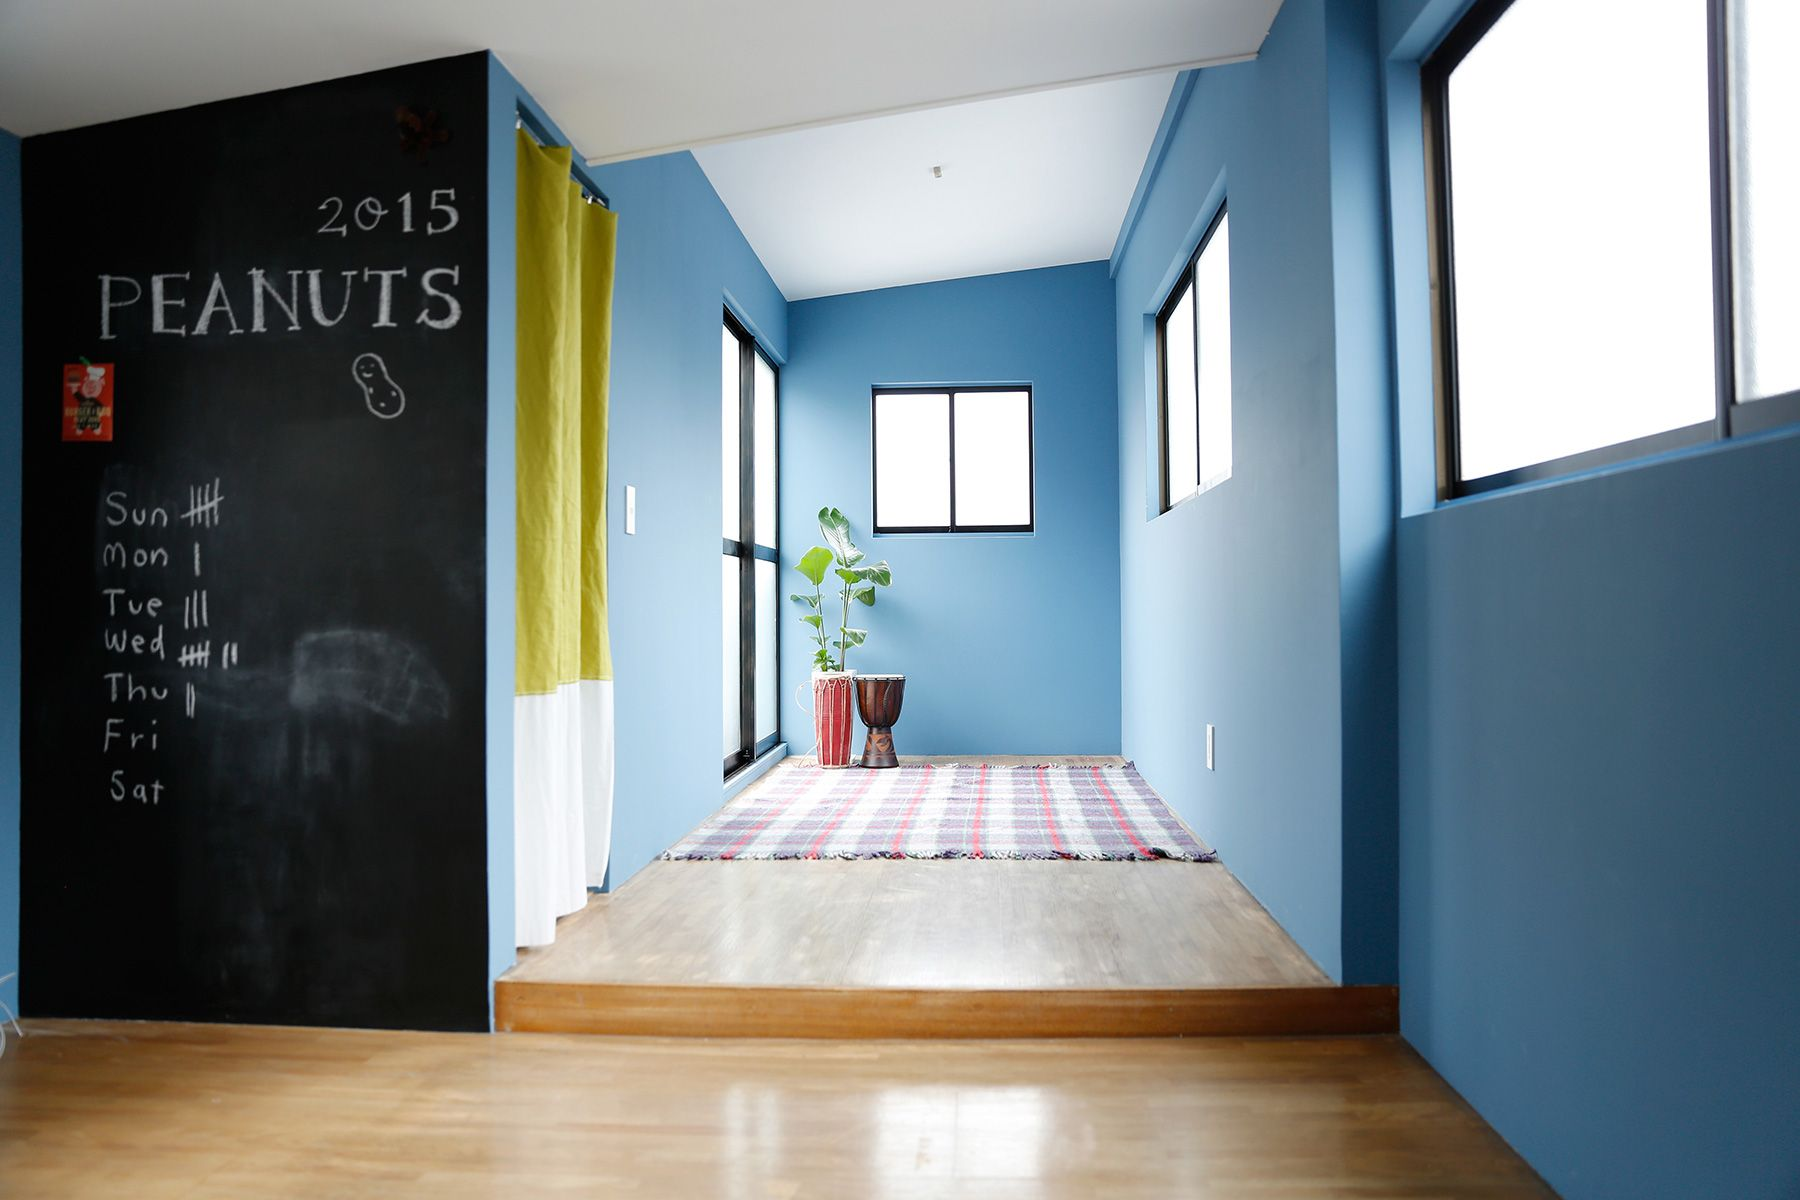 studio PEANUTS (スタジオ ピーナッツ)3F/小さなペントハウス